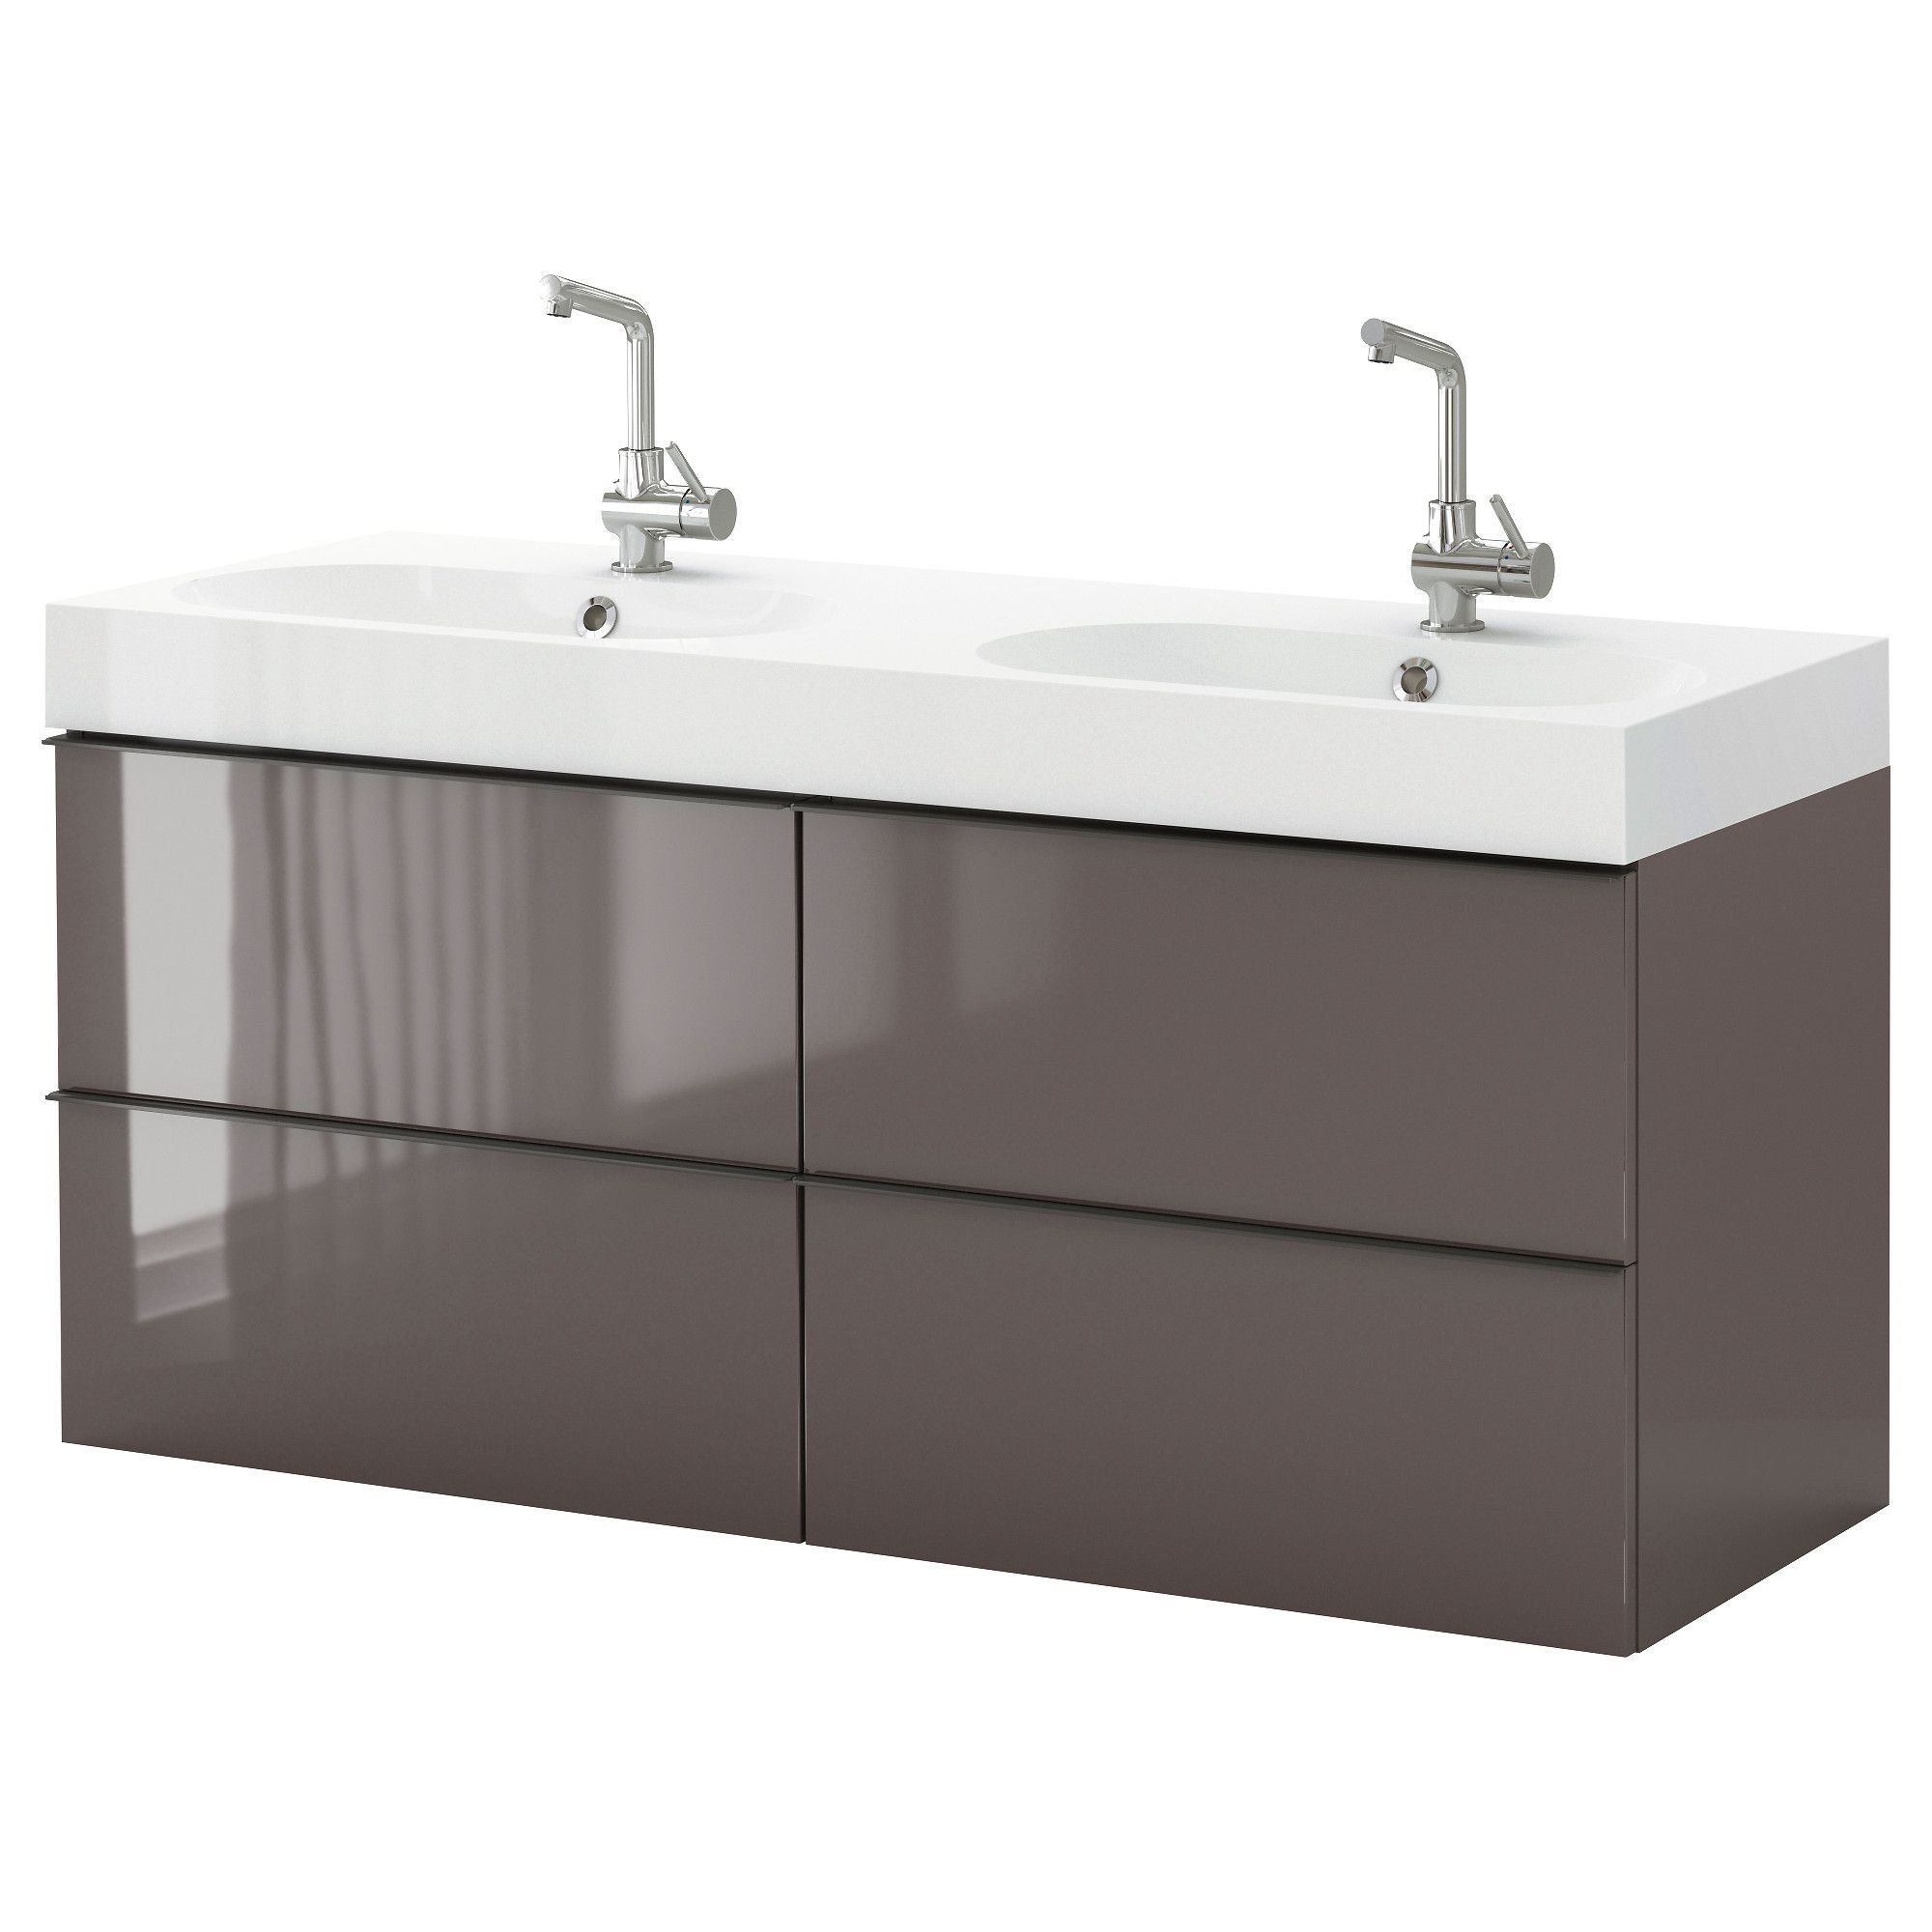 Awesome Grey Gloss Acrylic Double Sink Floating Ikea ...